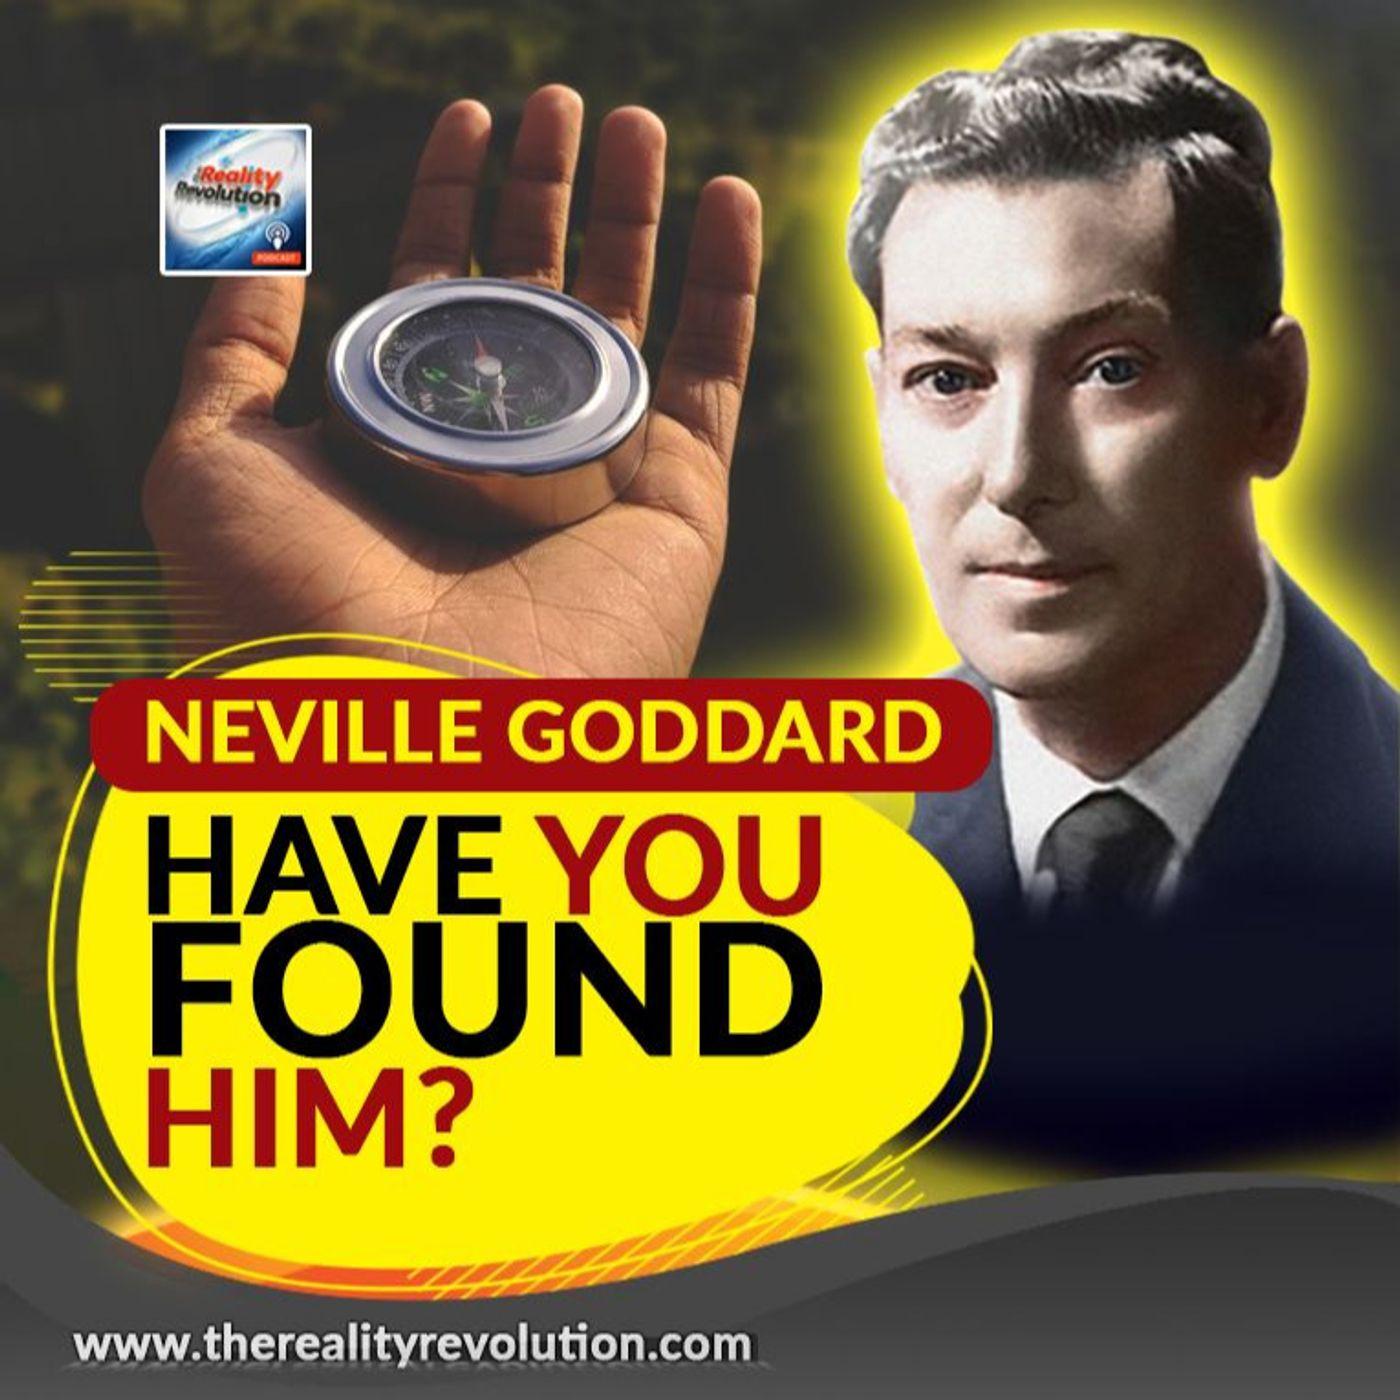 Neville Goddard - Have You Found Him?